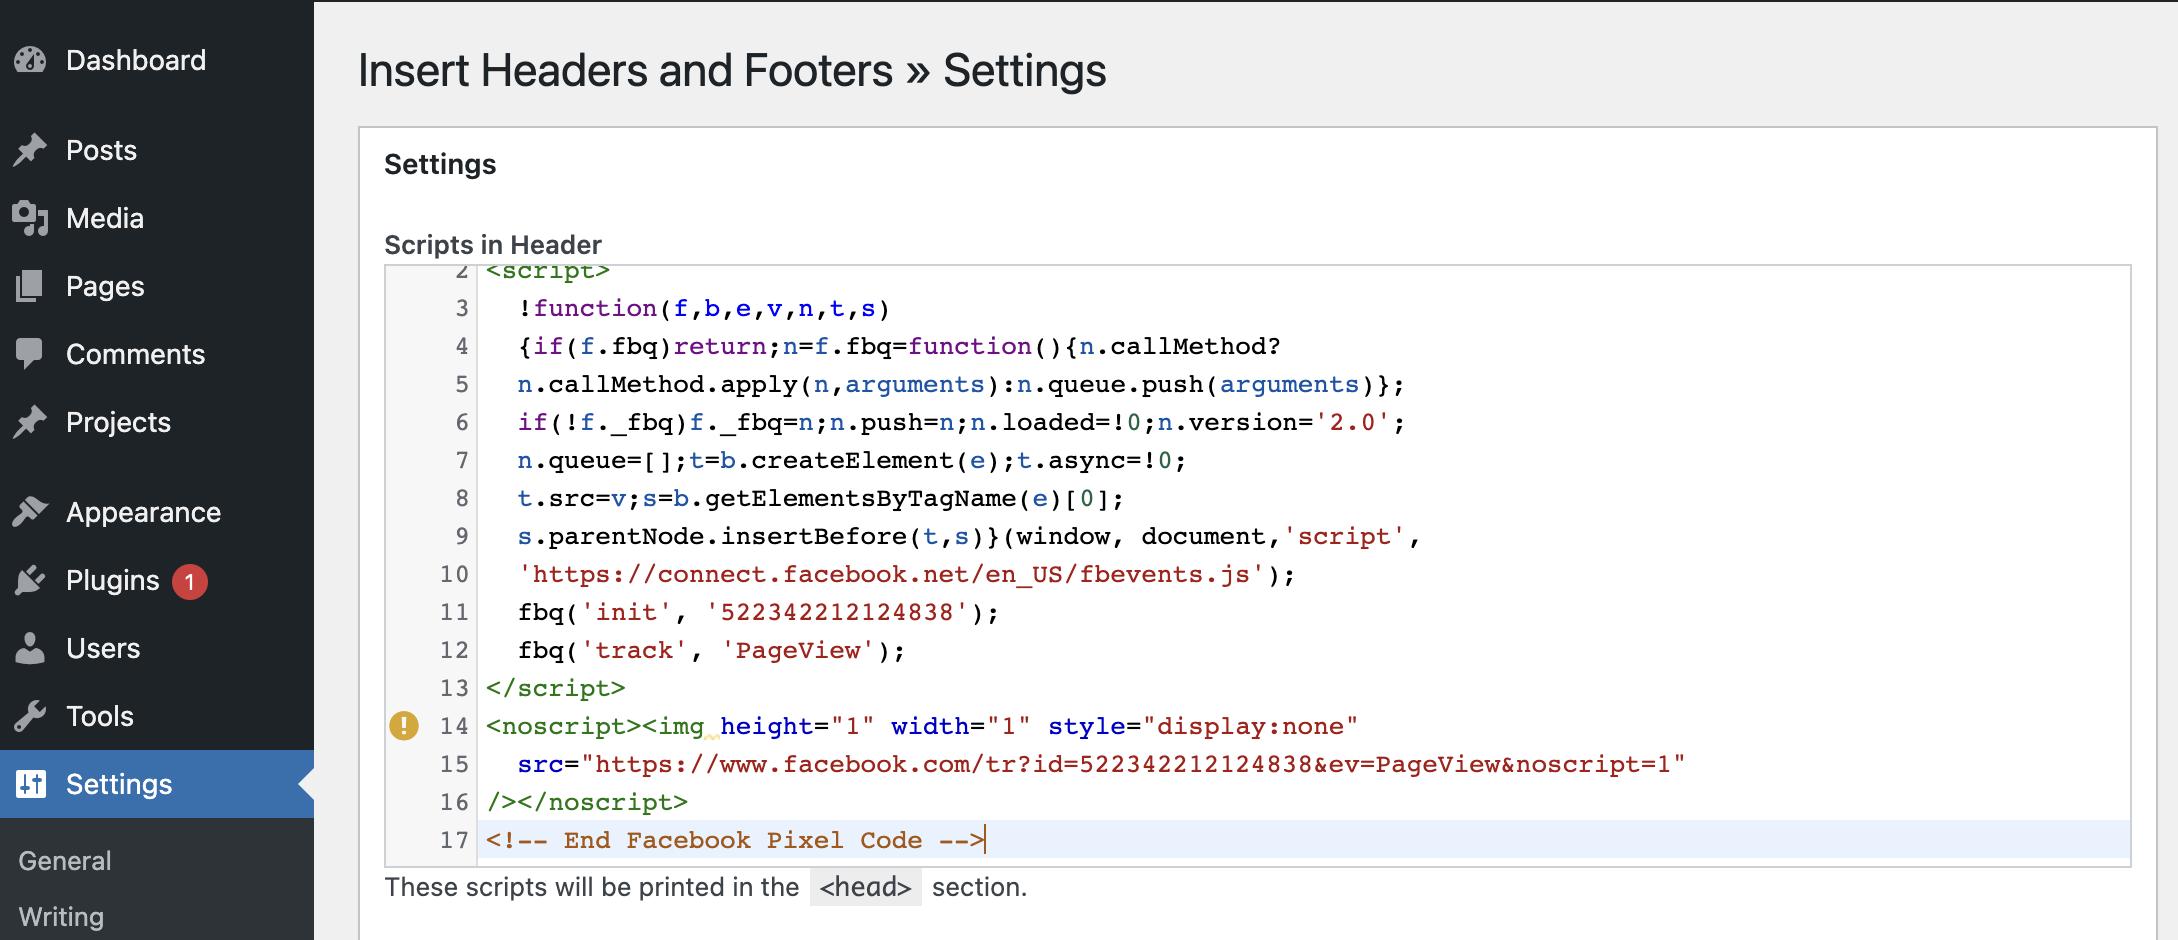 Paste Facebook Pixel into the Scripts in Header box